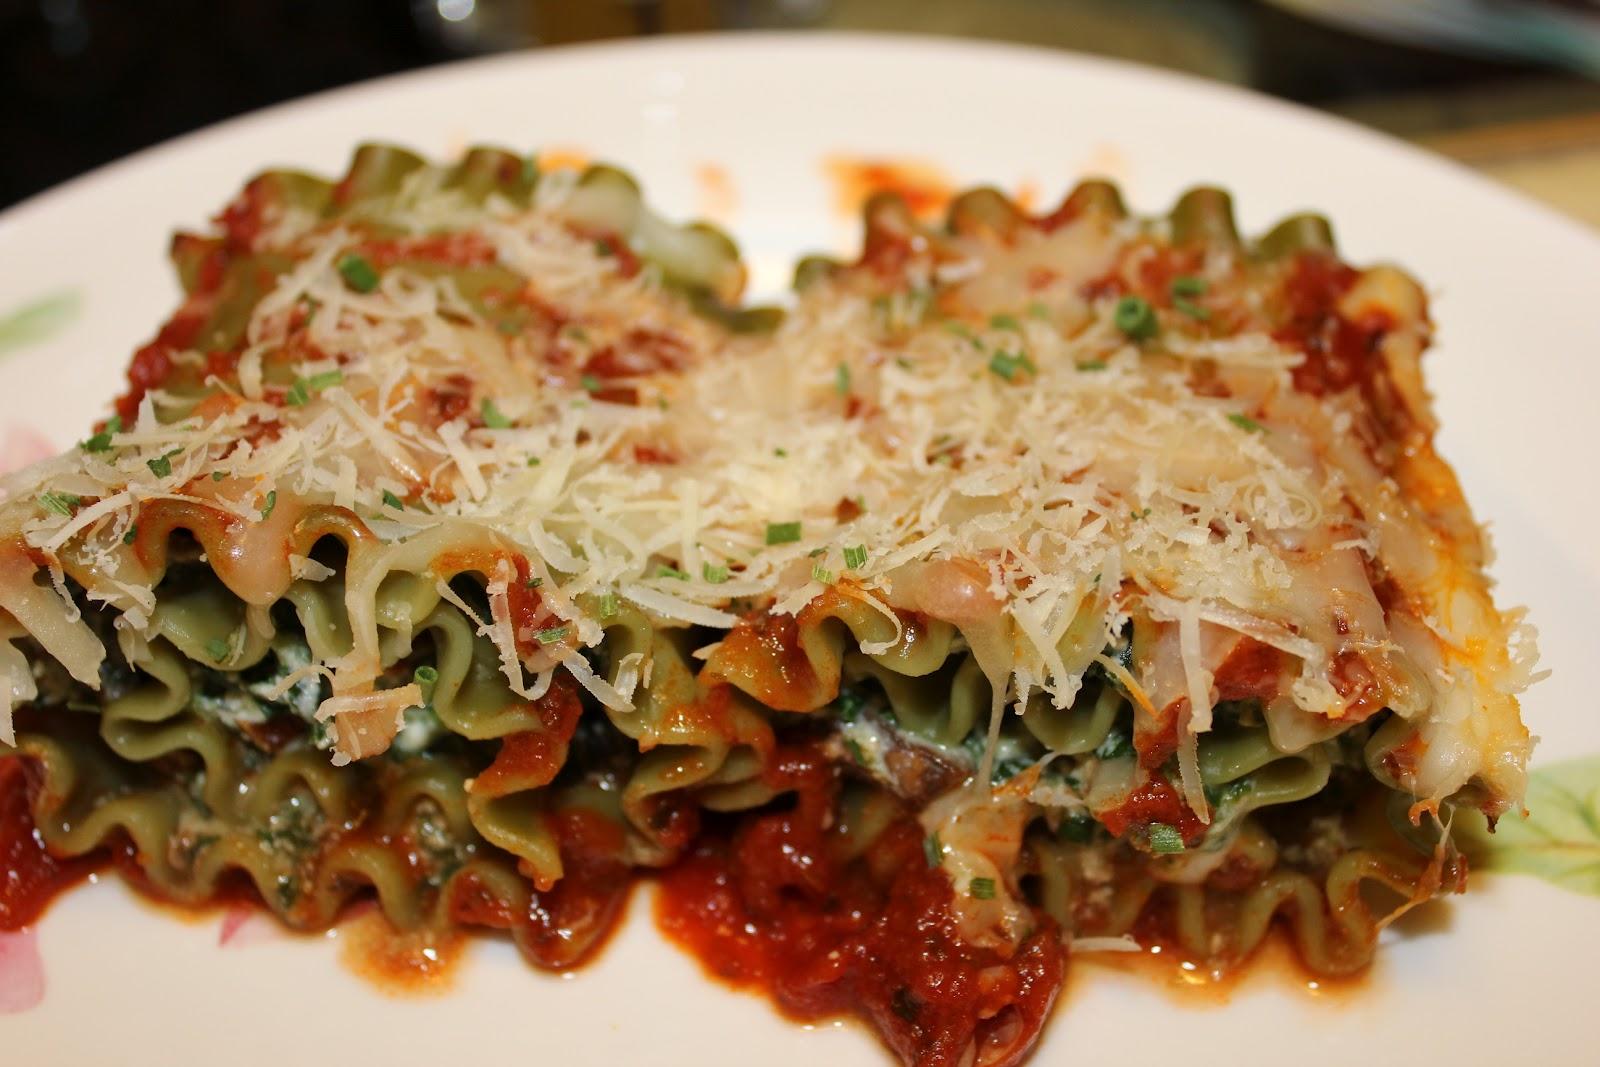 Erin's Kosher Cooking Adventures: Spinach Lasagna Roll-Ups